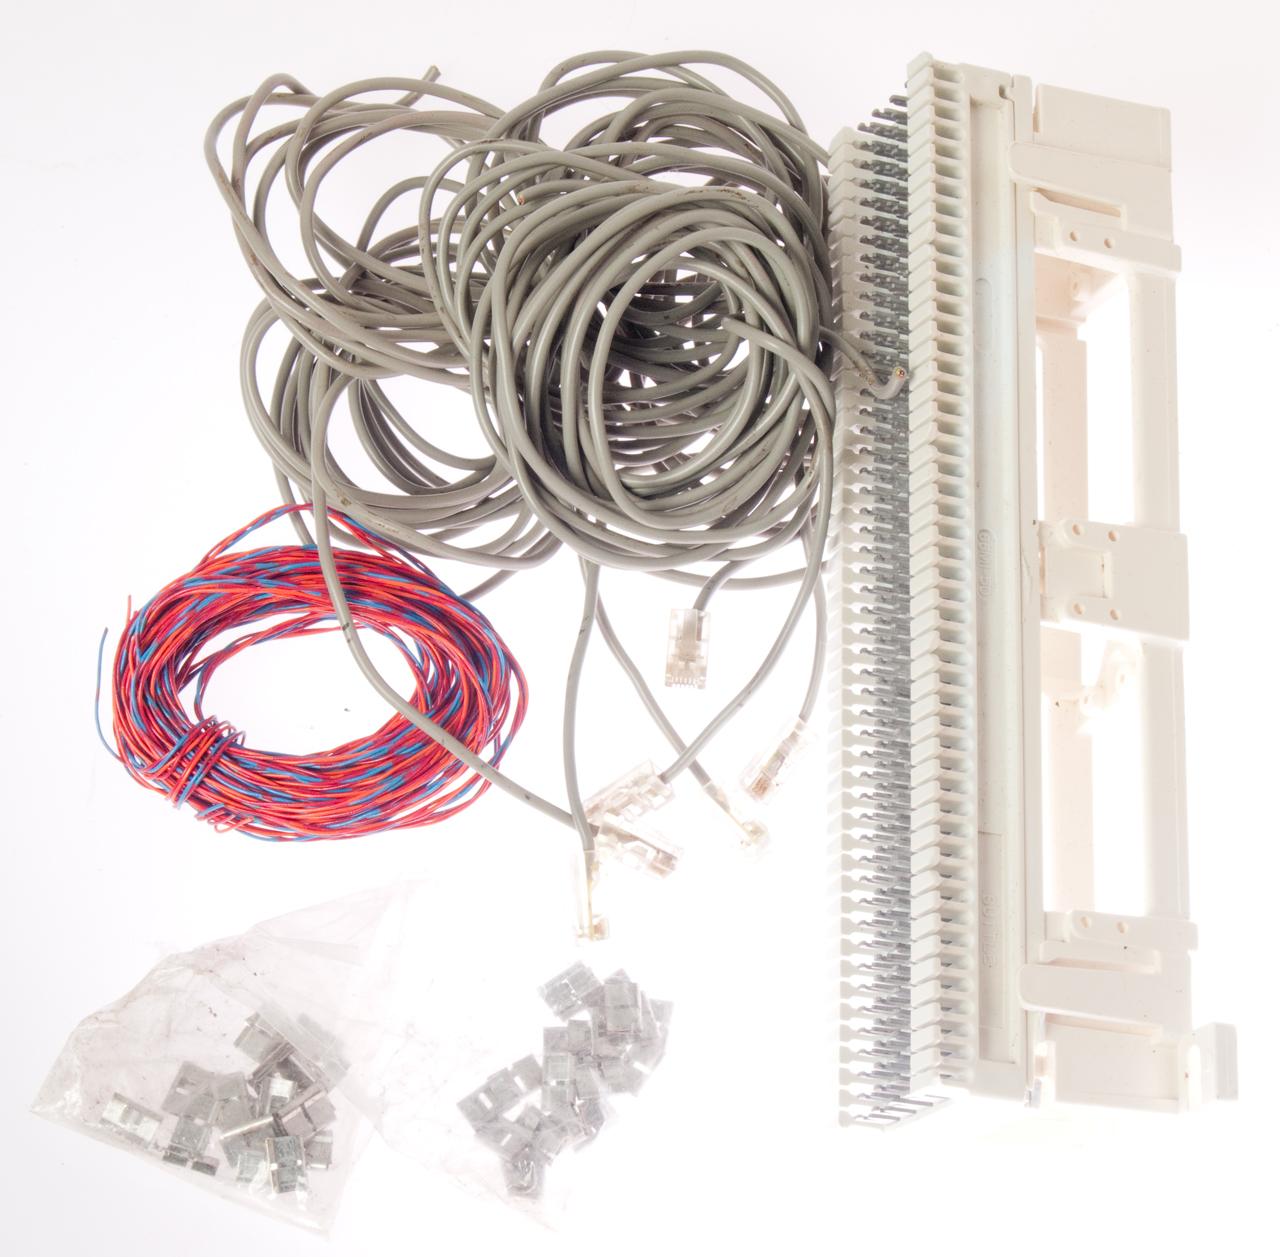 66 block wiring diagram 25 pair rs232 to rs485 converter circuit panasonic kx ta824 telephone system